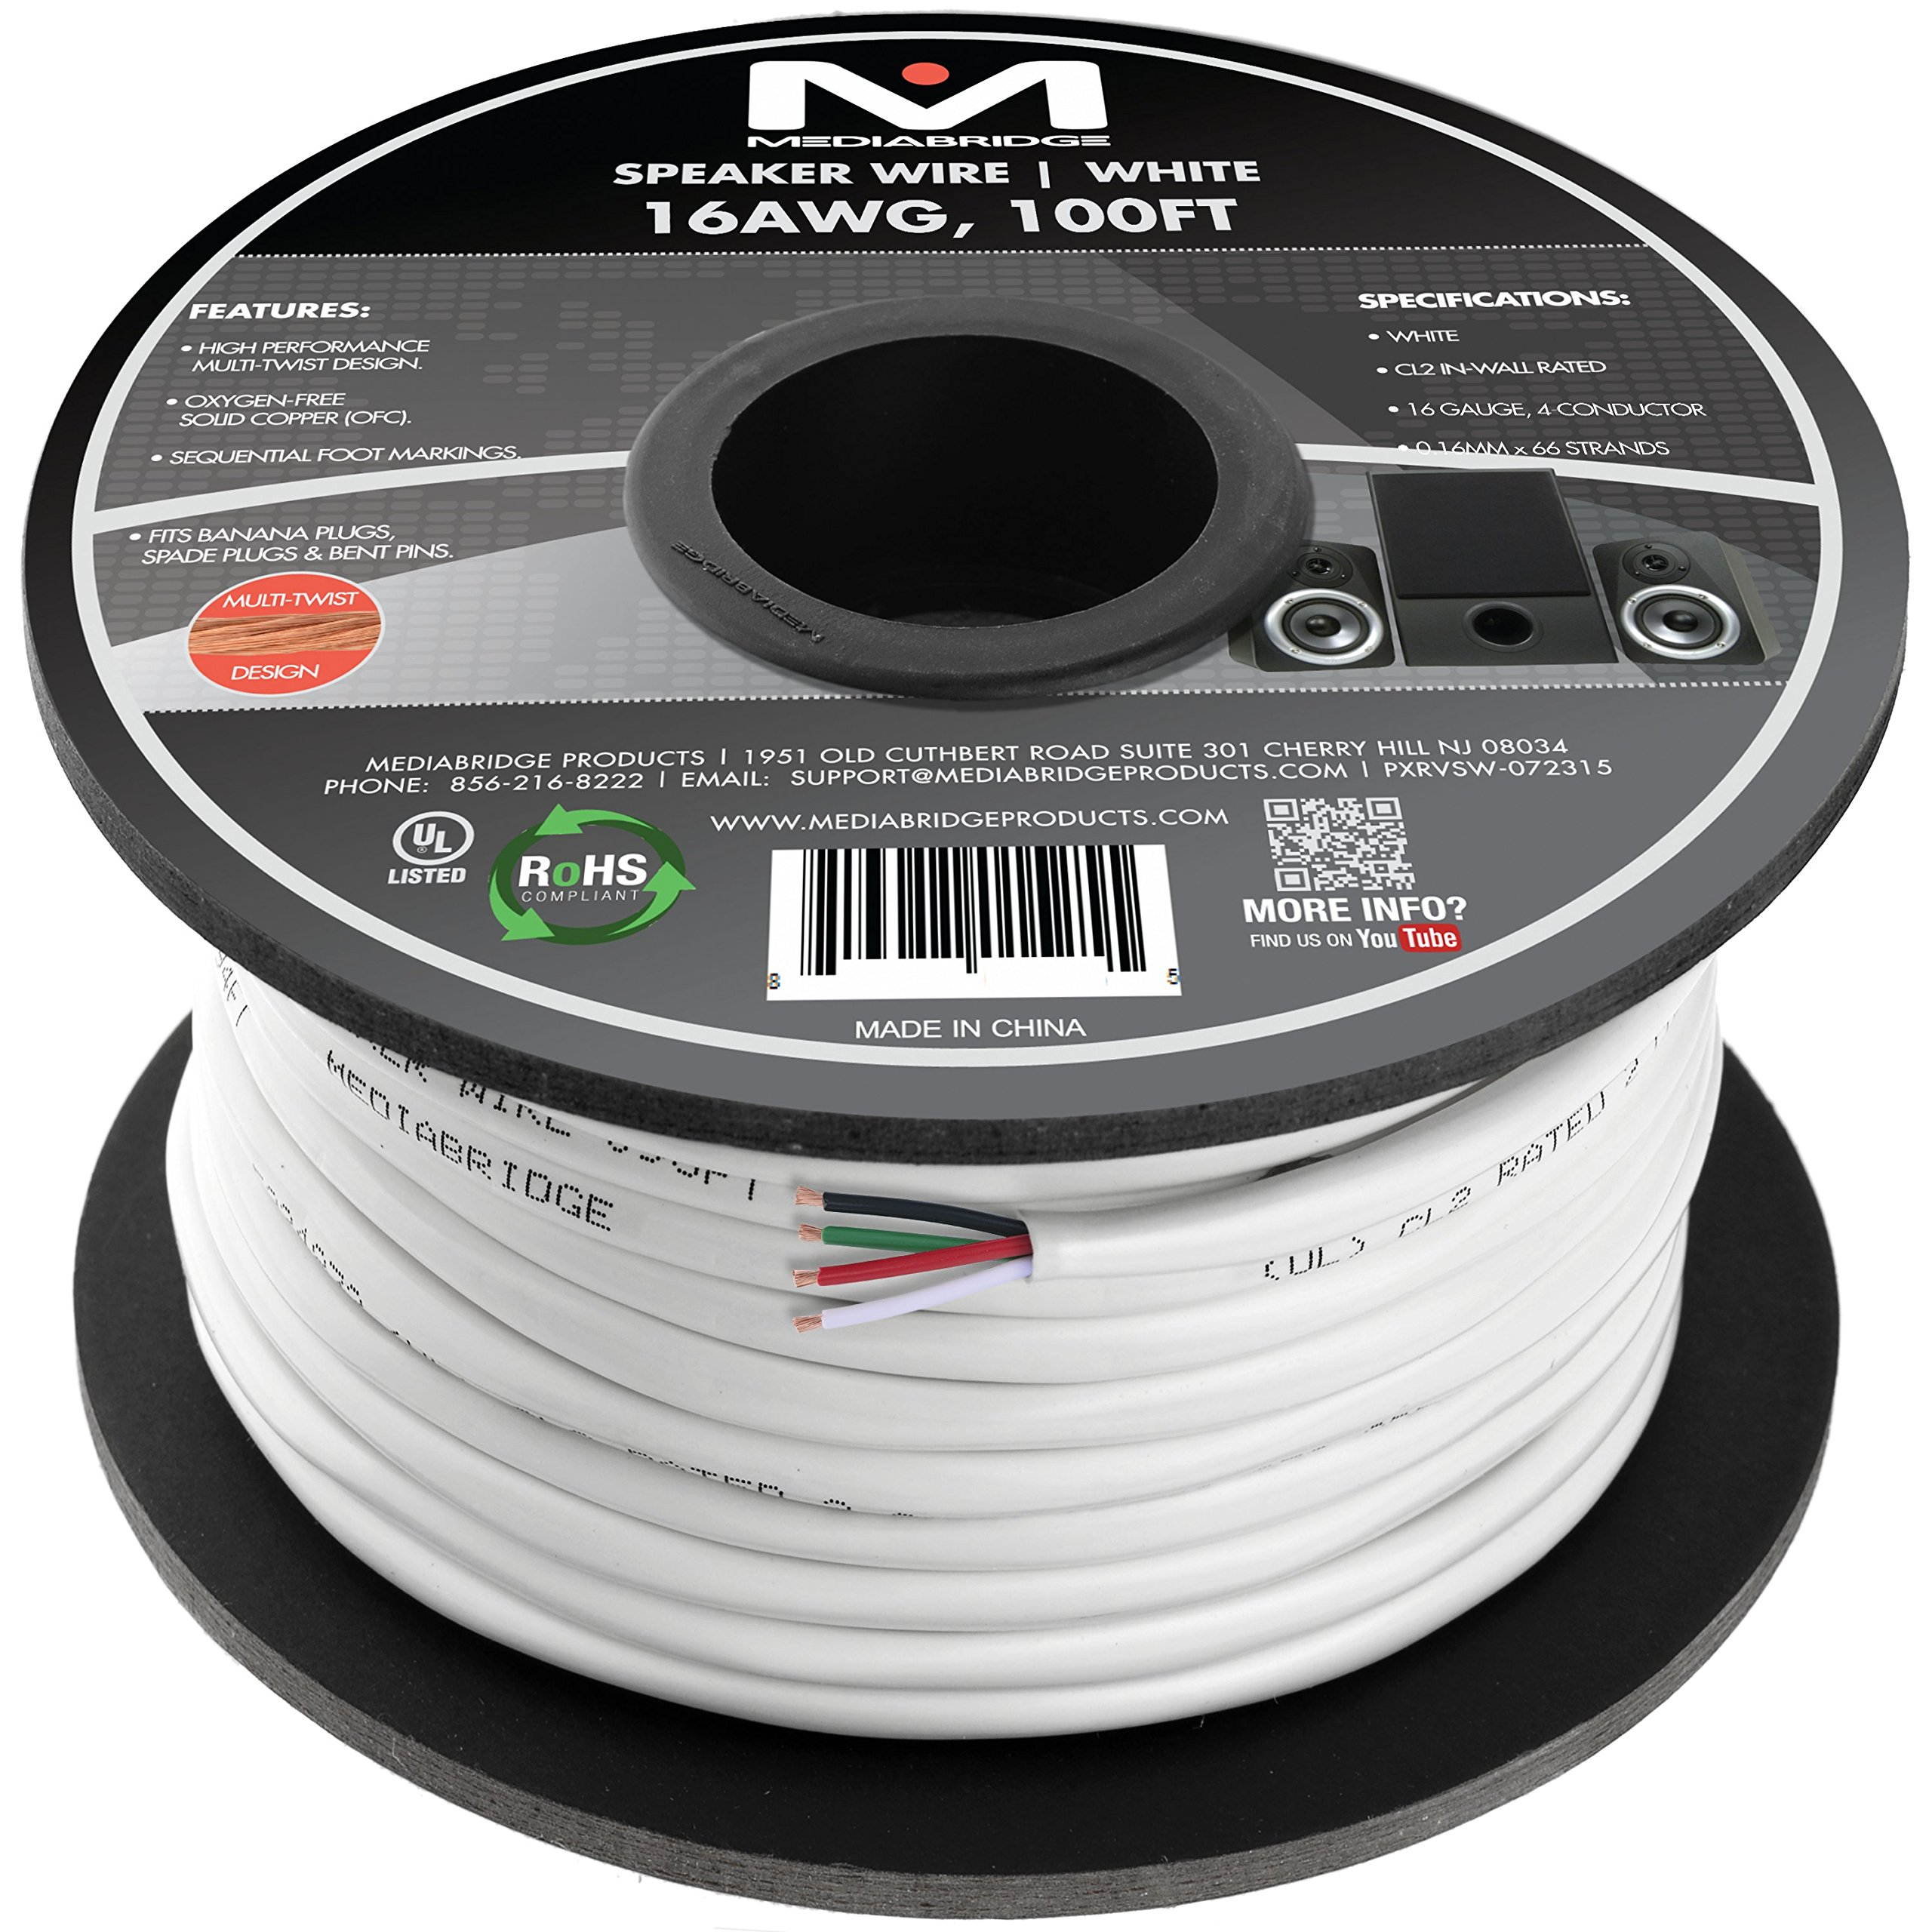 Mediabridge 16AWG 4-Conductor Speaker Wire (100 Feet, White) - 99.9% Oxygen Free Copper - CL2 for In-Wall ( SW-16X4-100-WH )